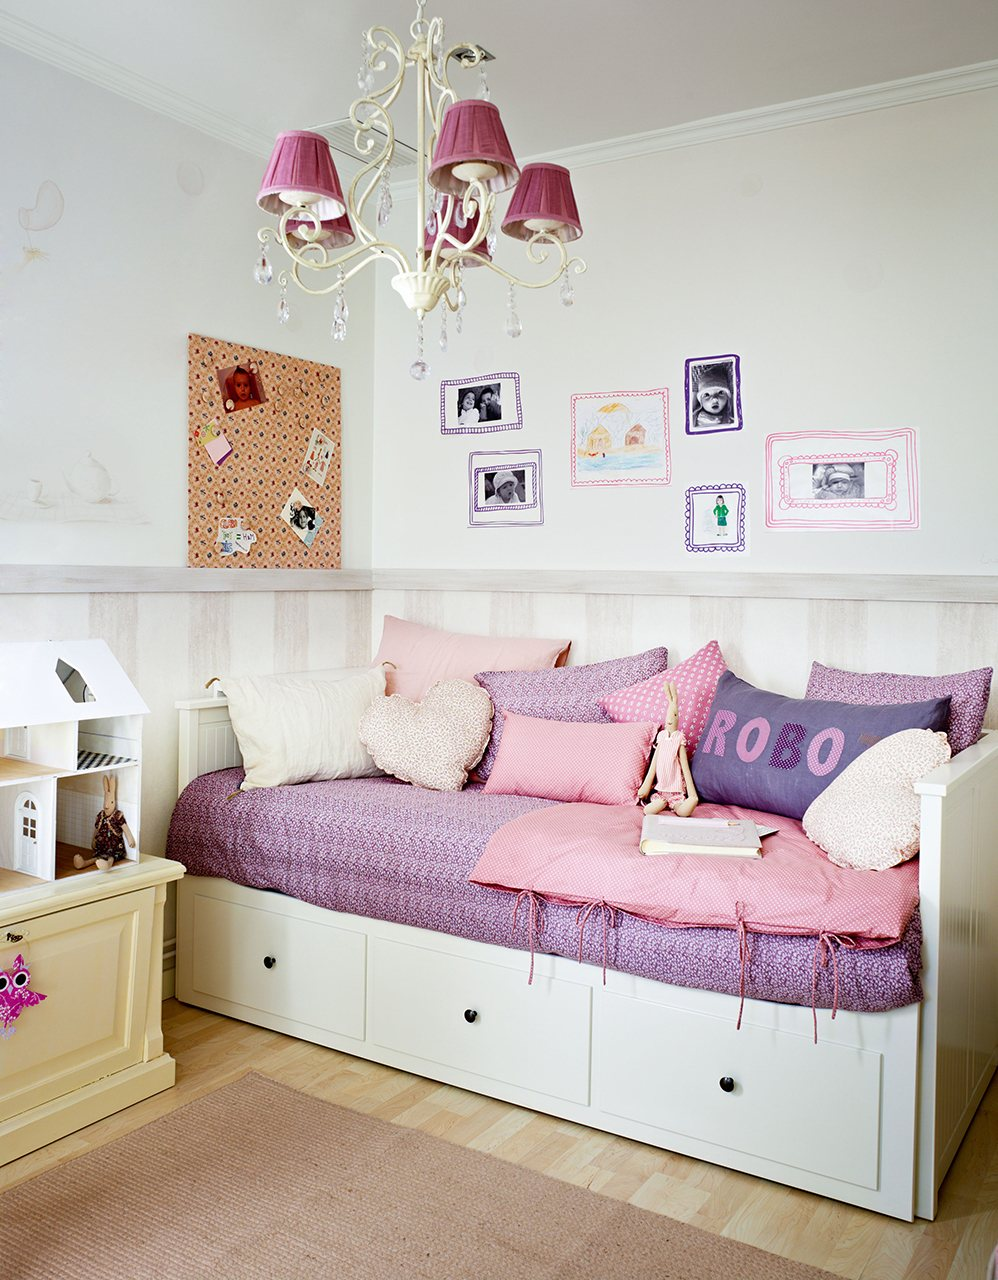 Solo cama tus gustos tu hogar - Cama nido nina ...